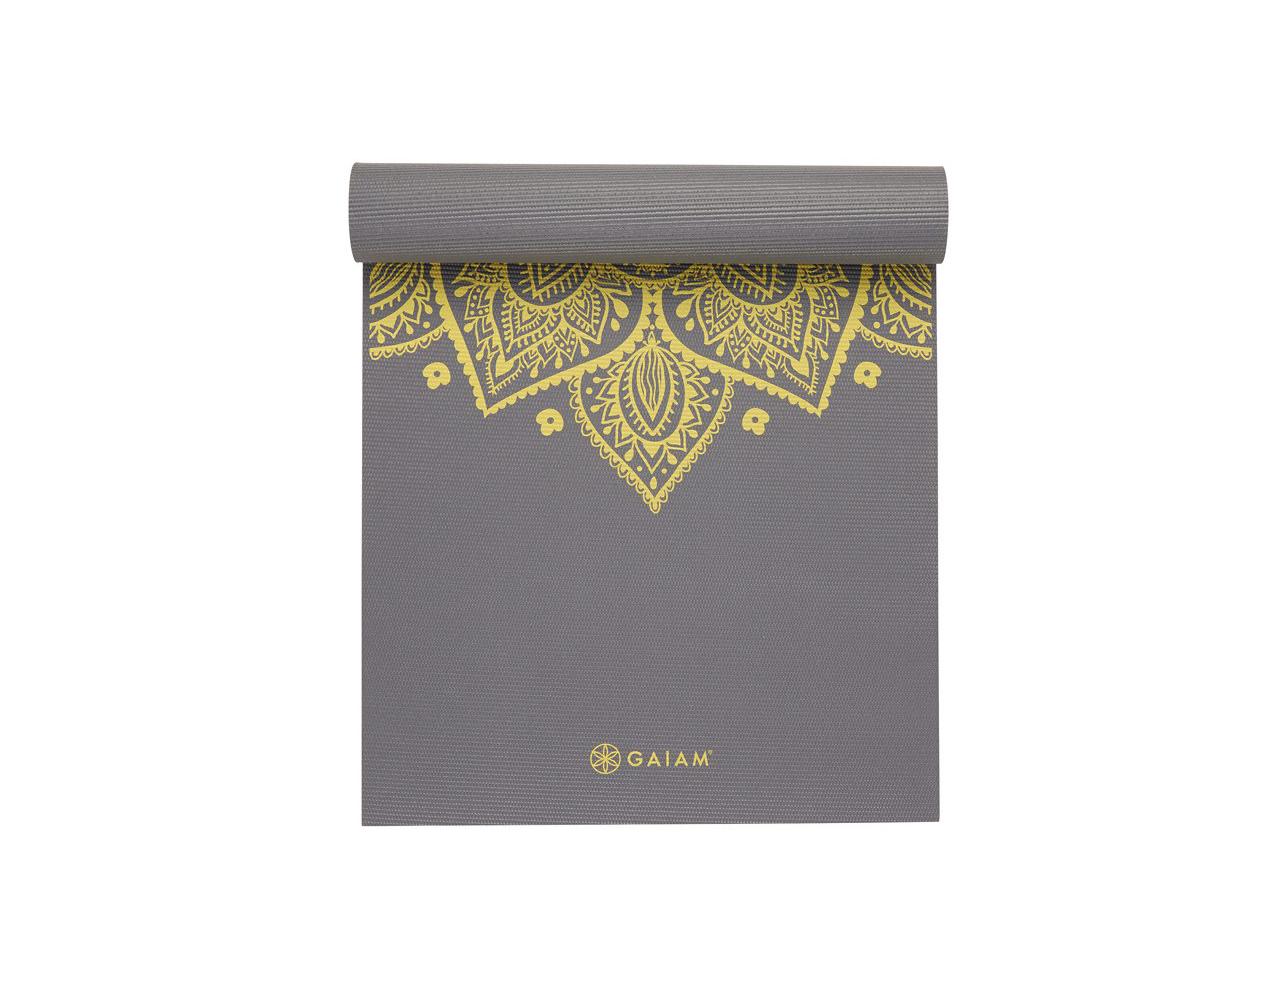 Gaiam citron sundial yoga matt. A latex free, light tack non-slip grip yoga Matt that comes with 5mm of premium durable/lightweight cushioning. Lifetime guarantee.